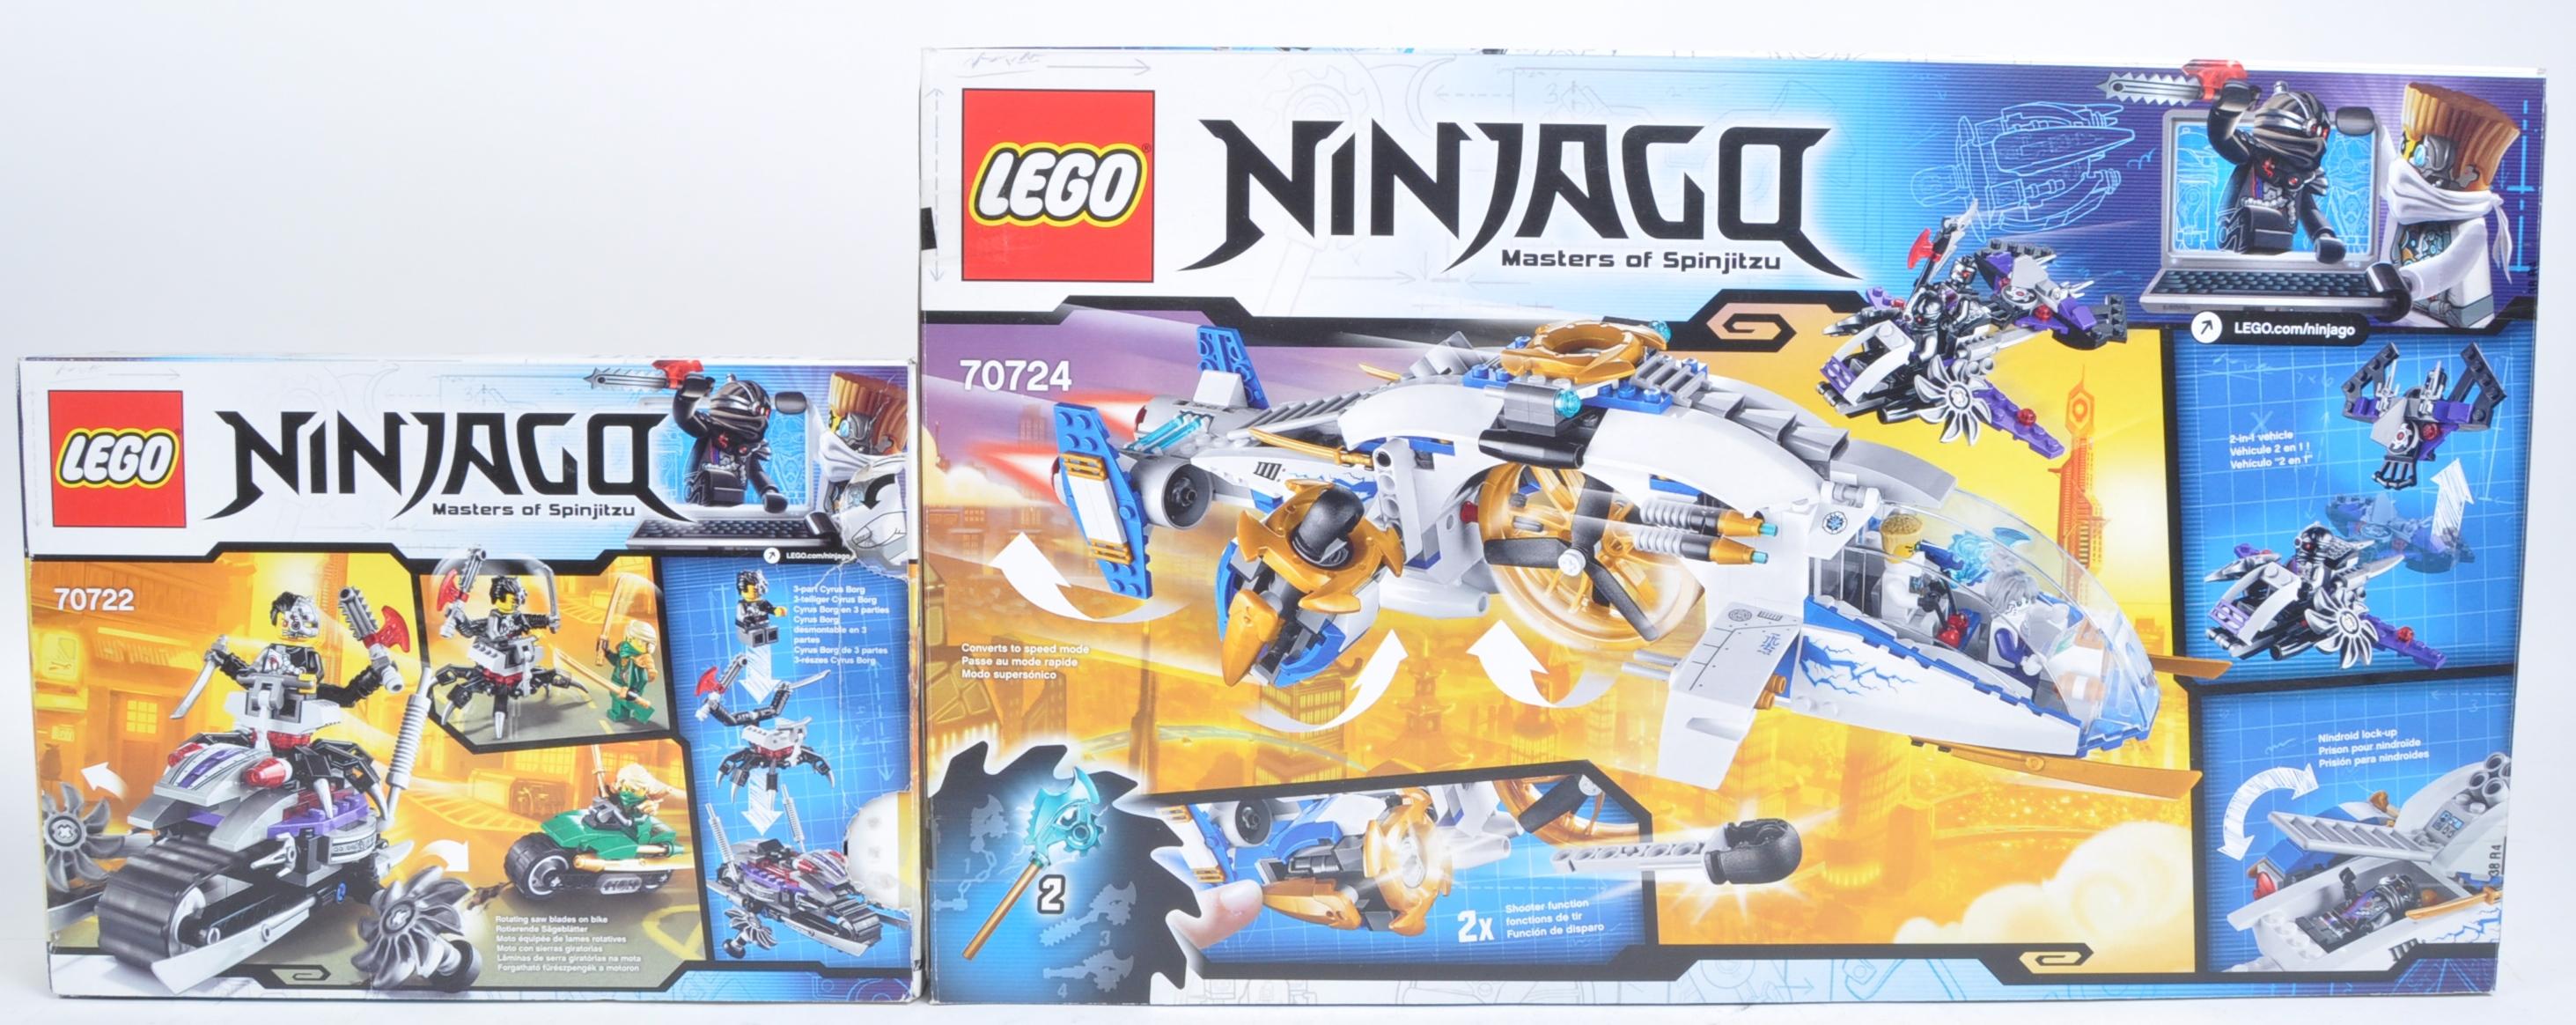 LEGO SETS - NINJAGO MASTERS OF SPINJITZU - 70722 / 70724 - Image 2 of 6